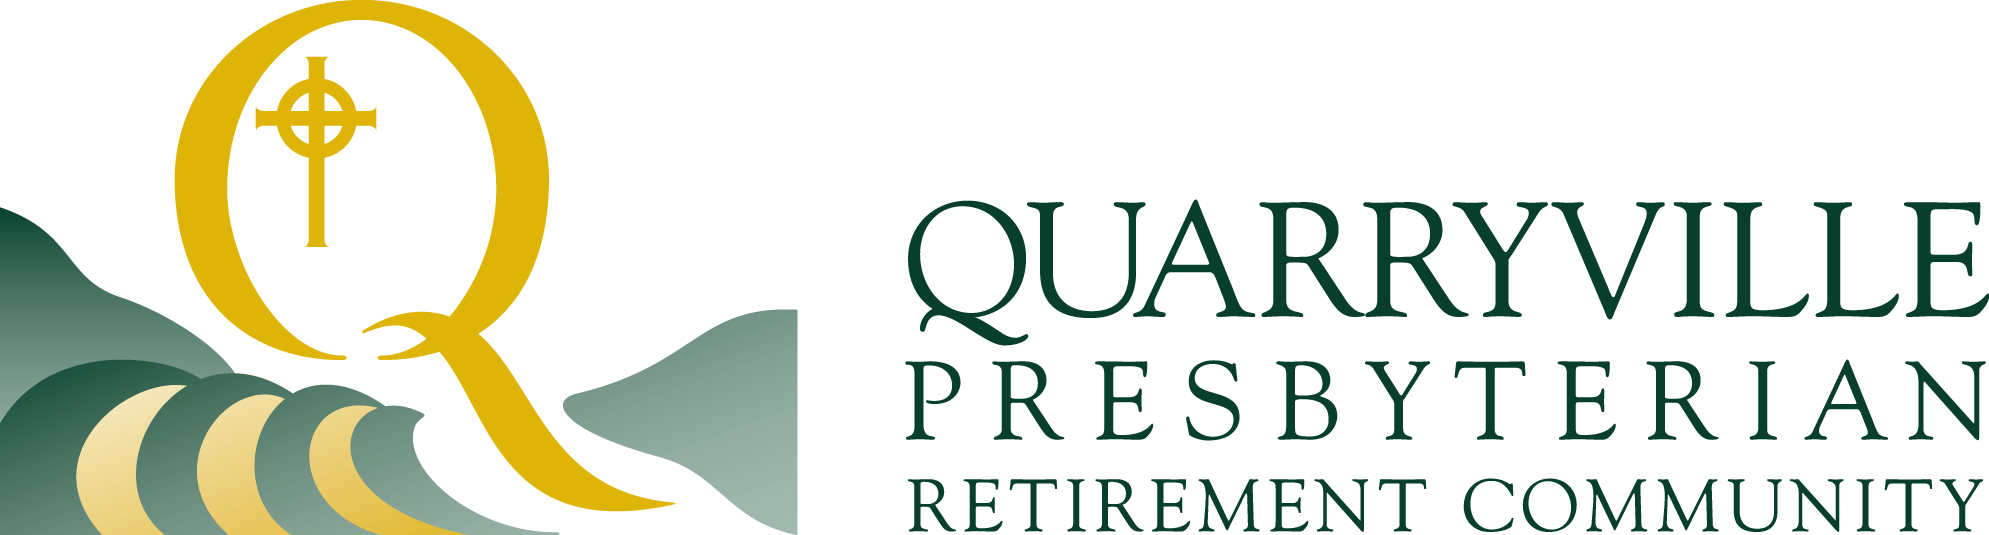 Quarryville Presbyterian Retirement Community in Quarryville, PA, photo #2